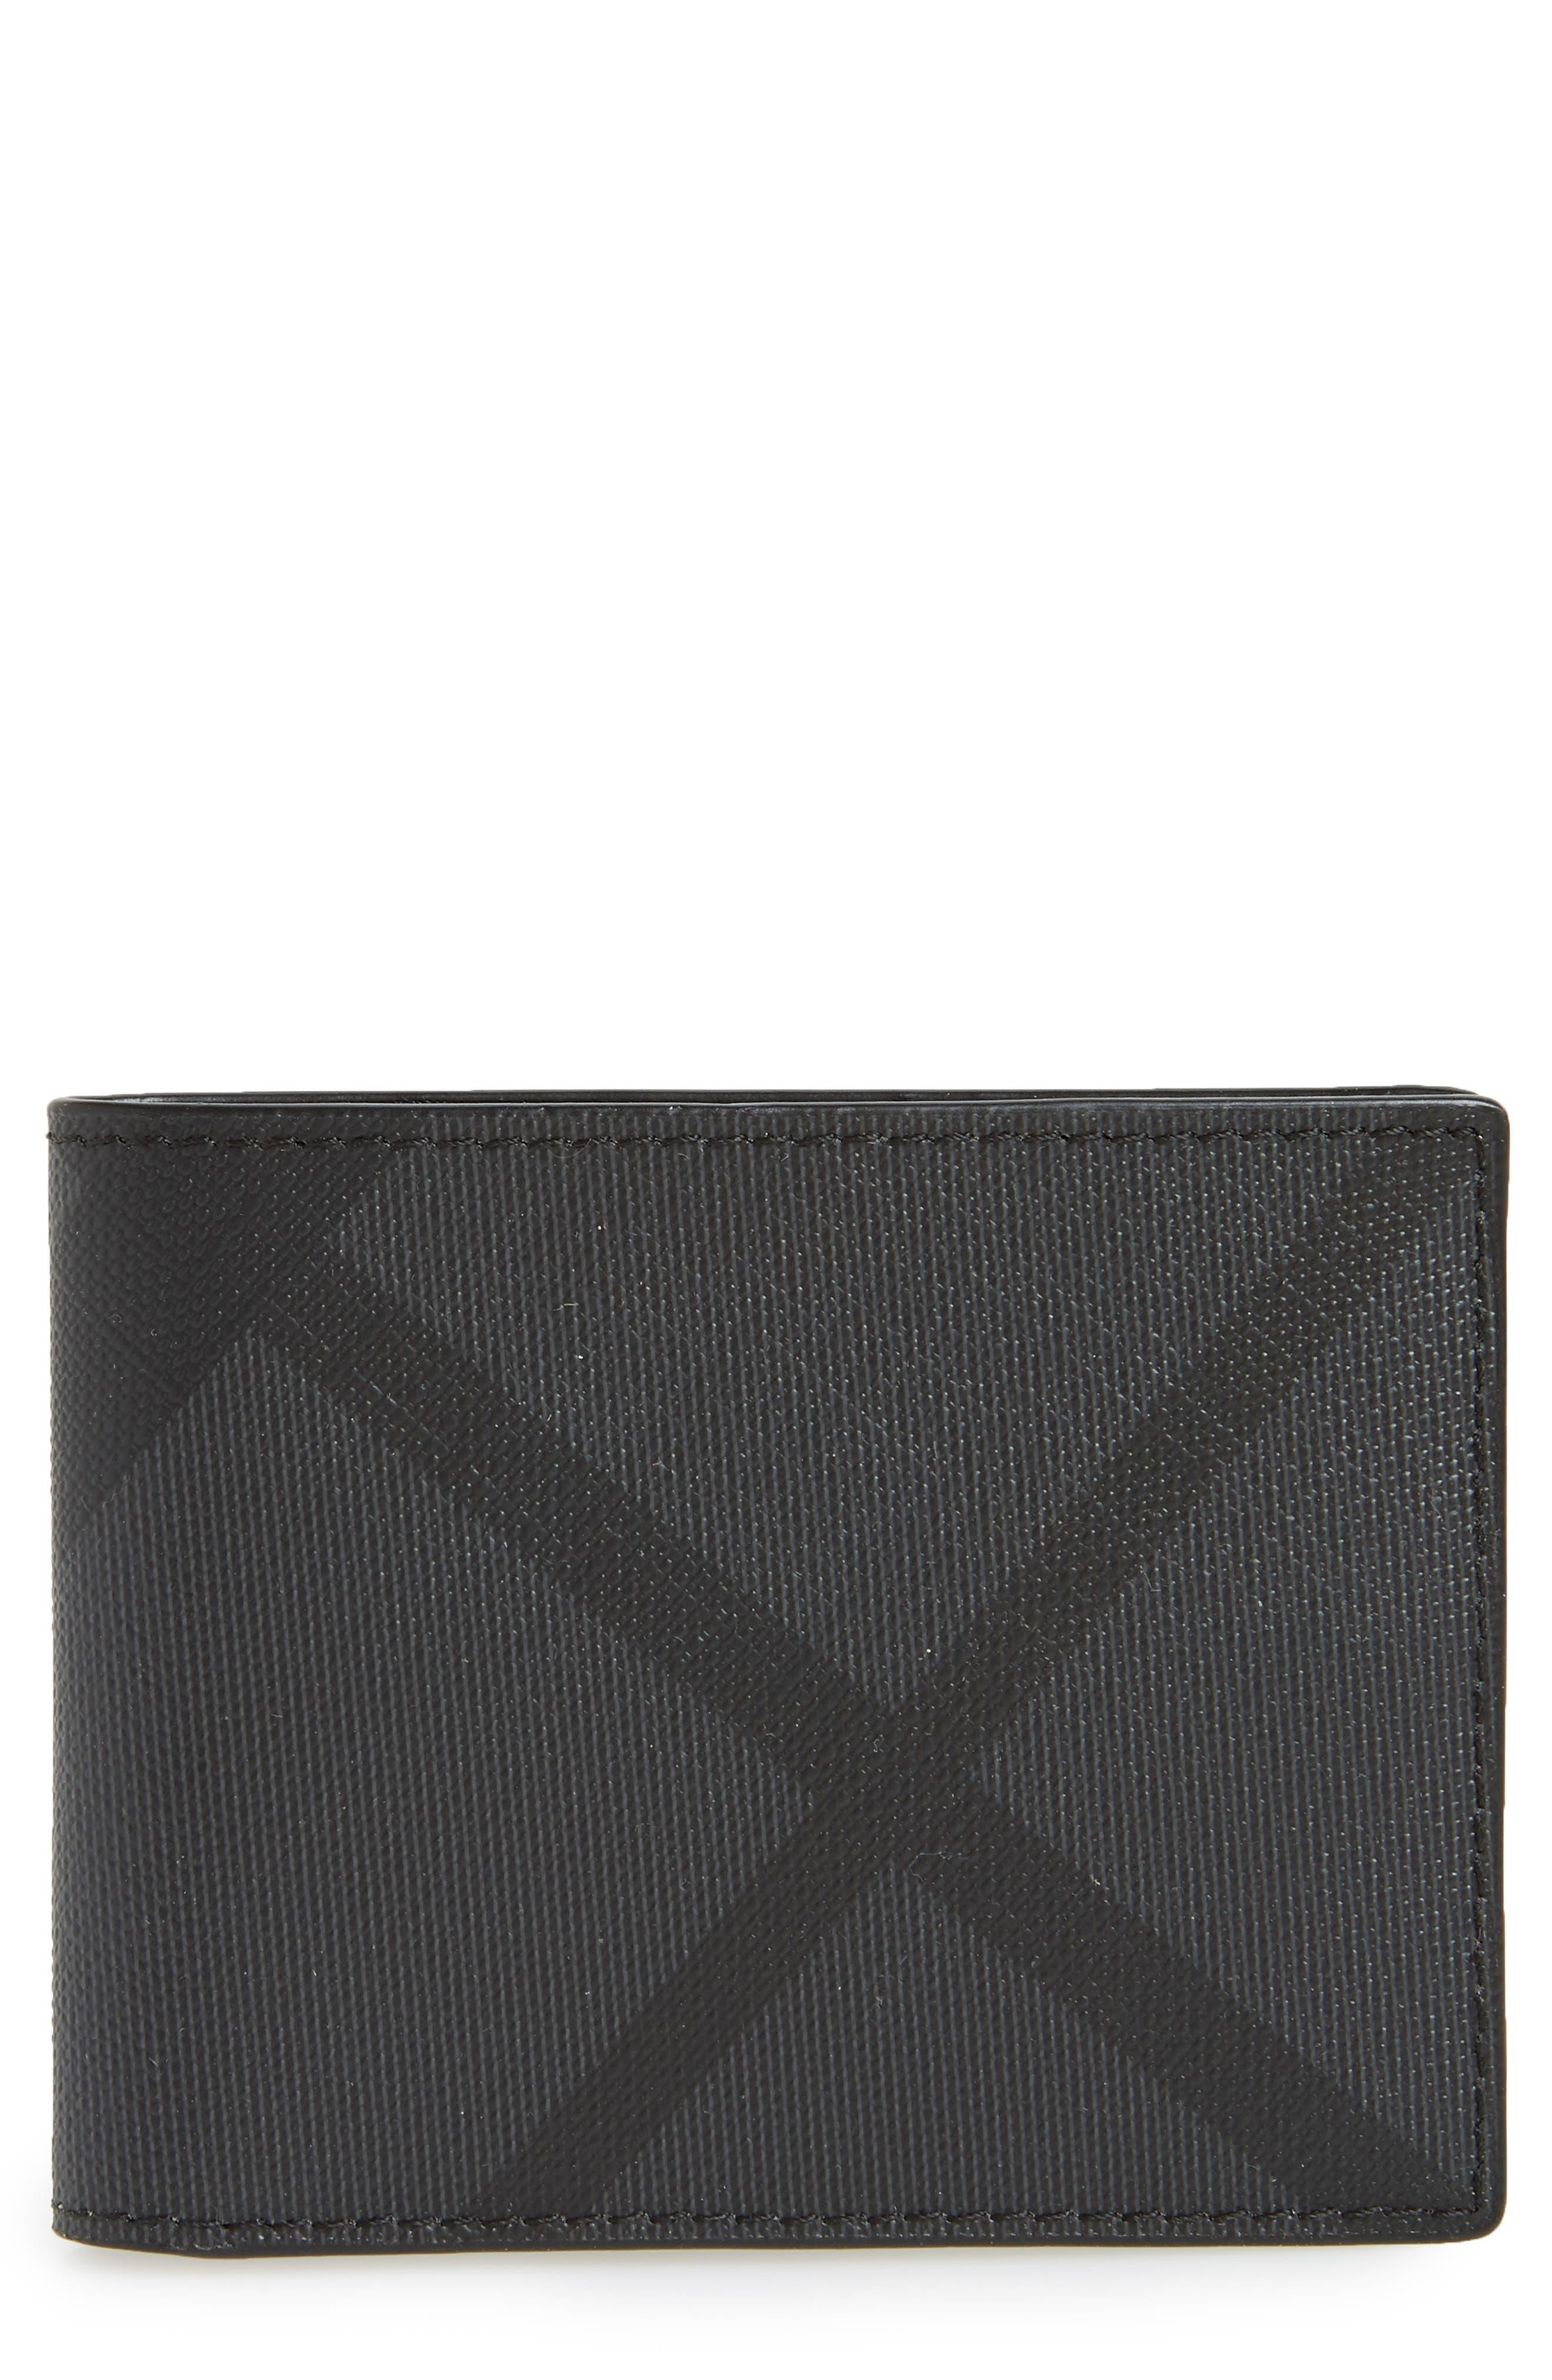 gucci wallet for men. burberry london wallet gucci for men